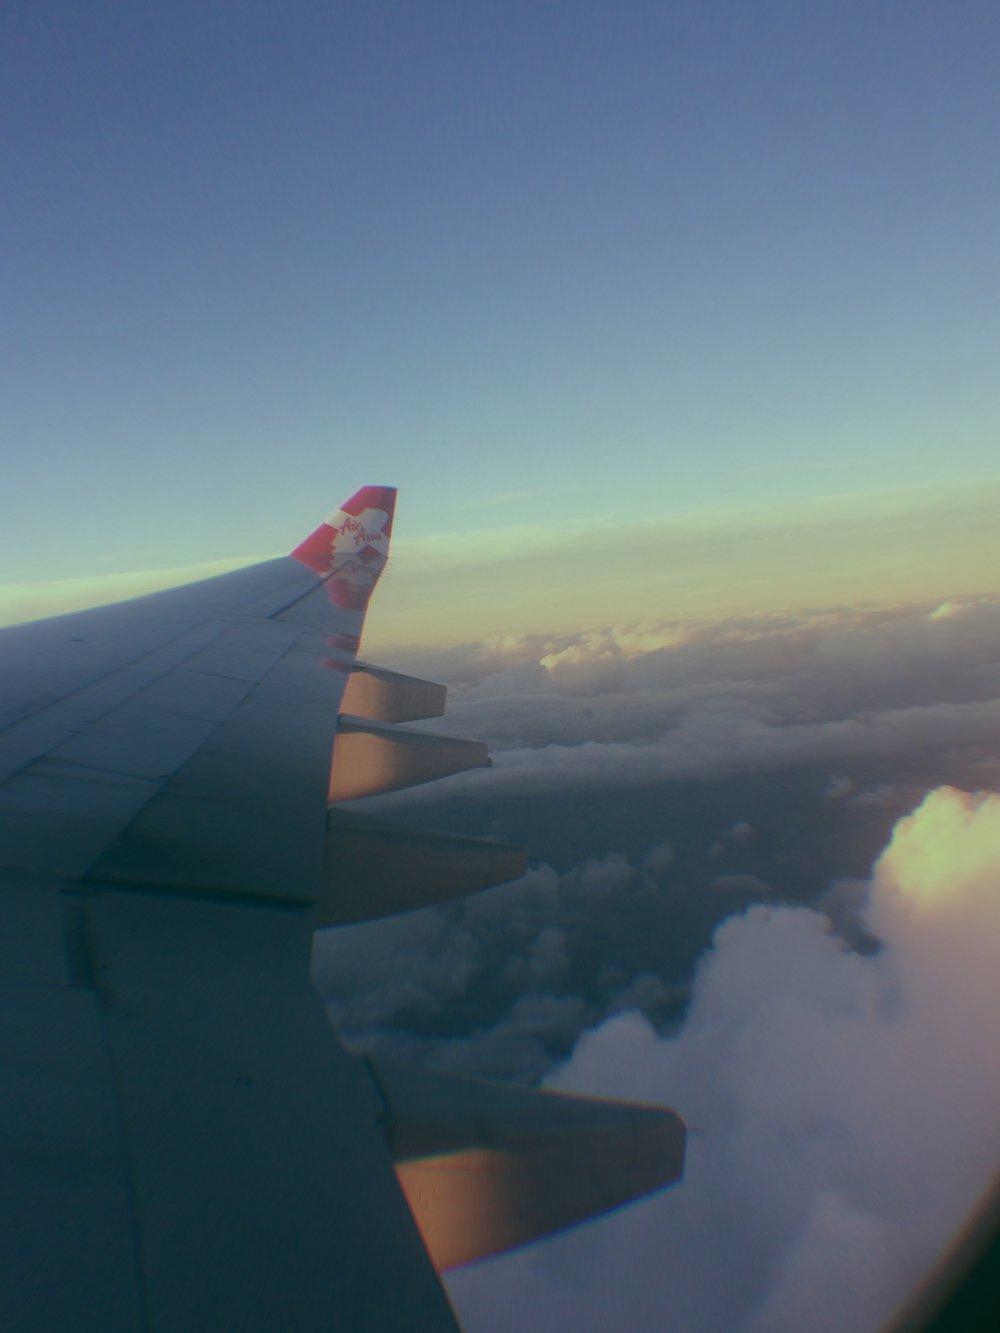 En route to Taiwan